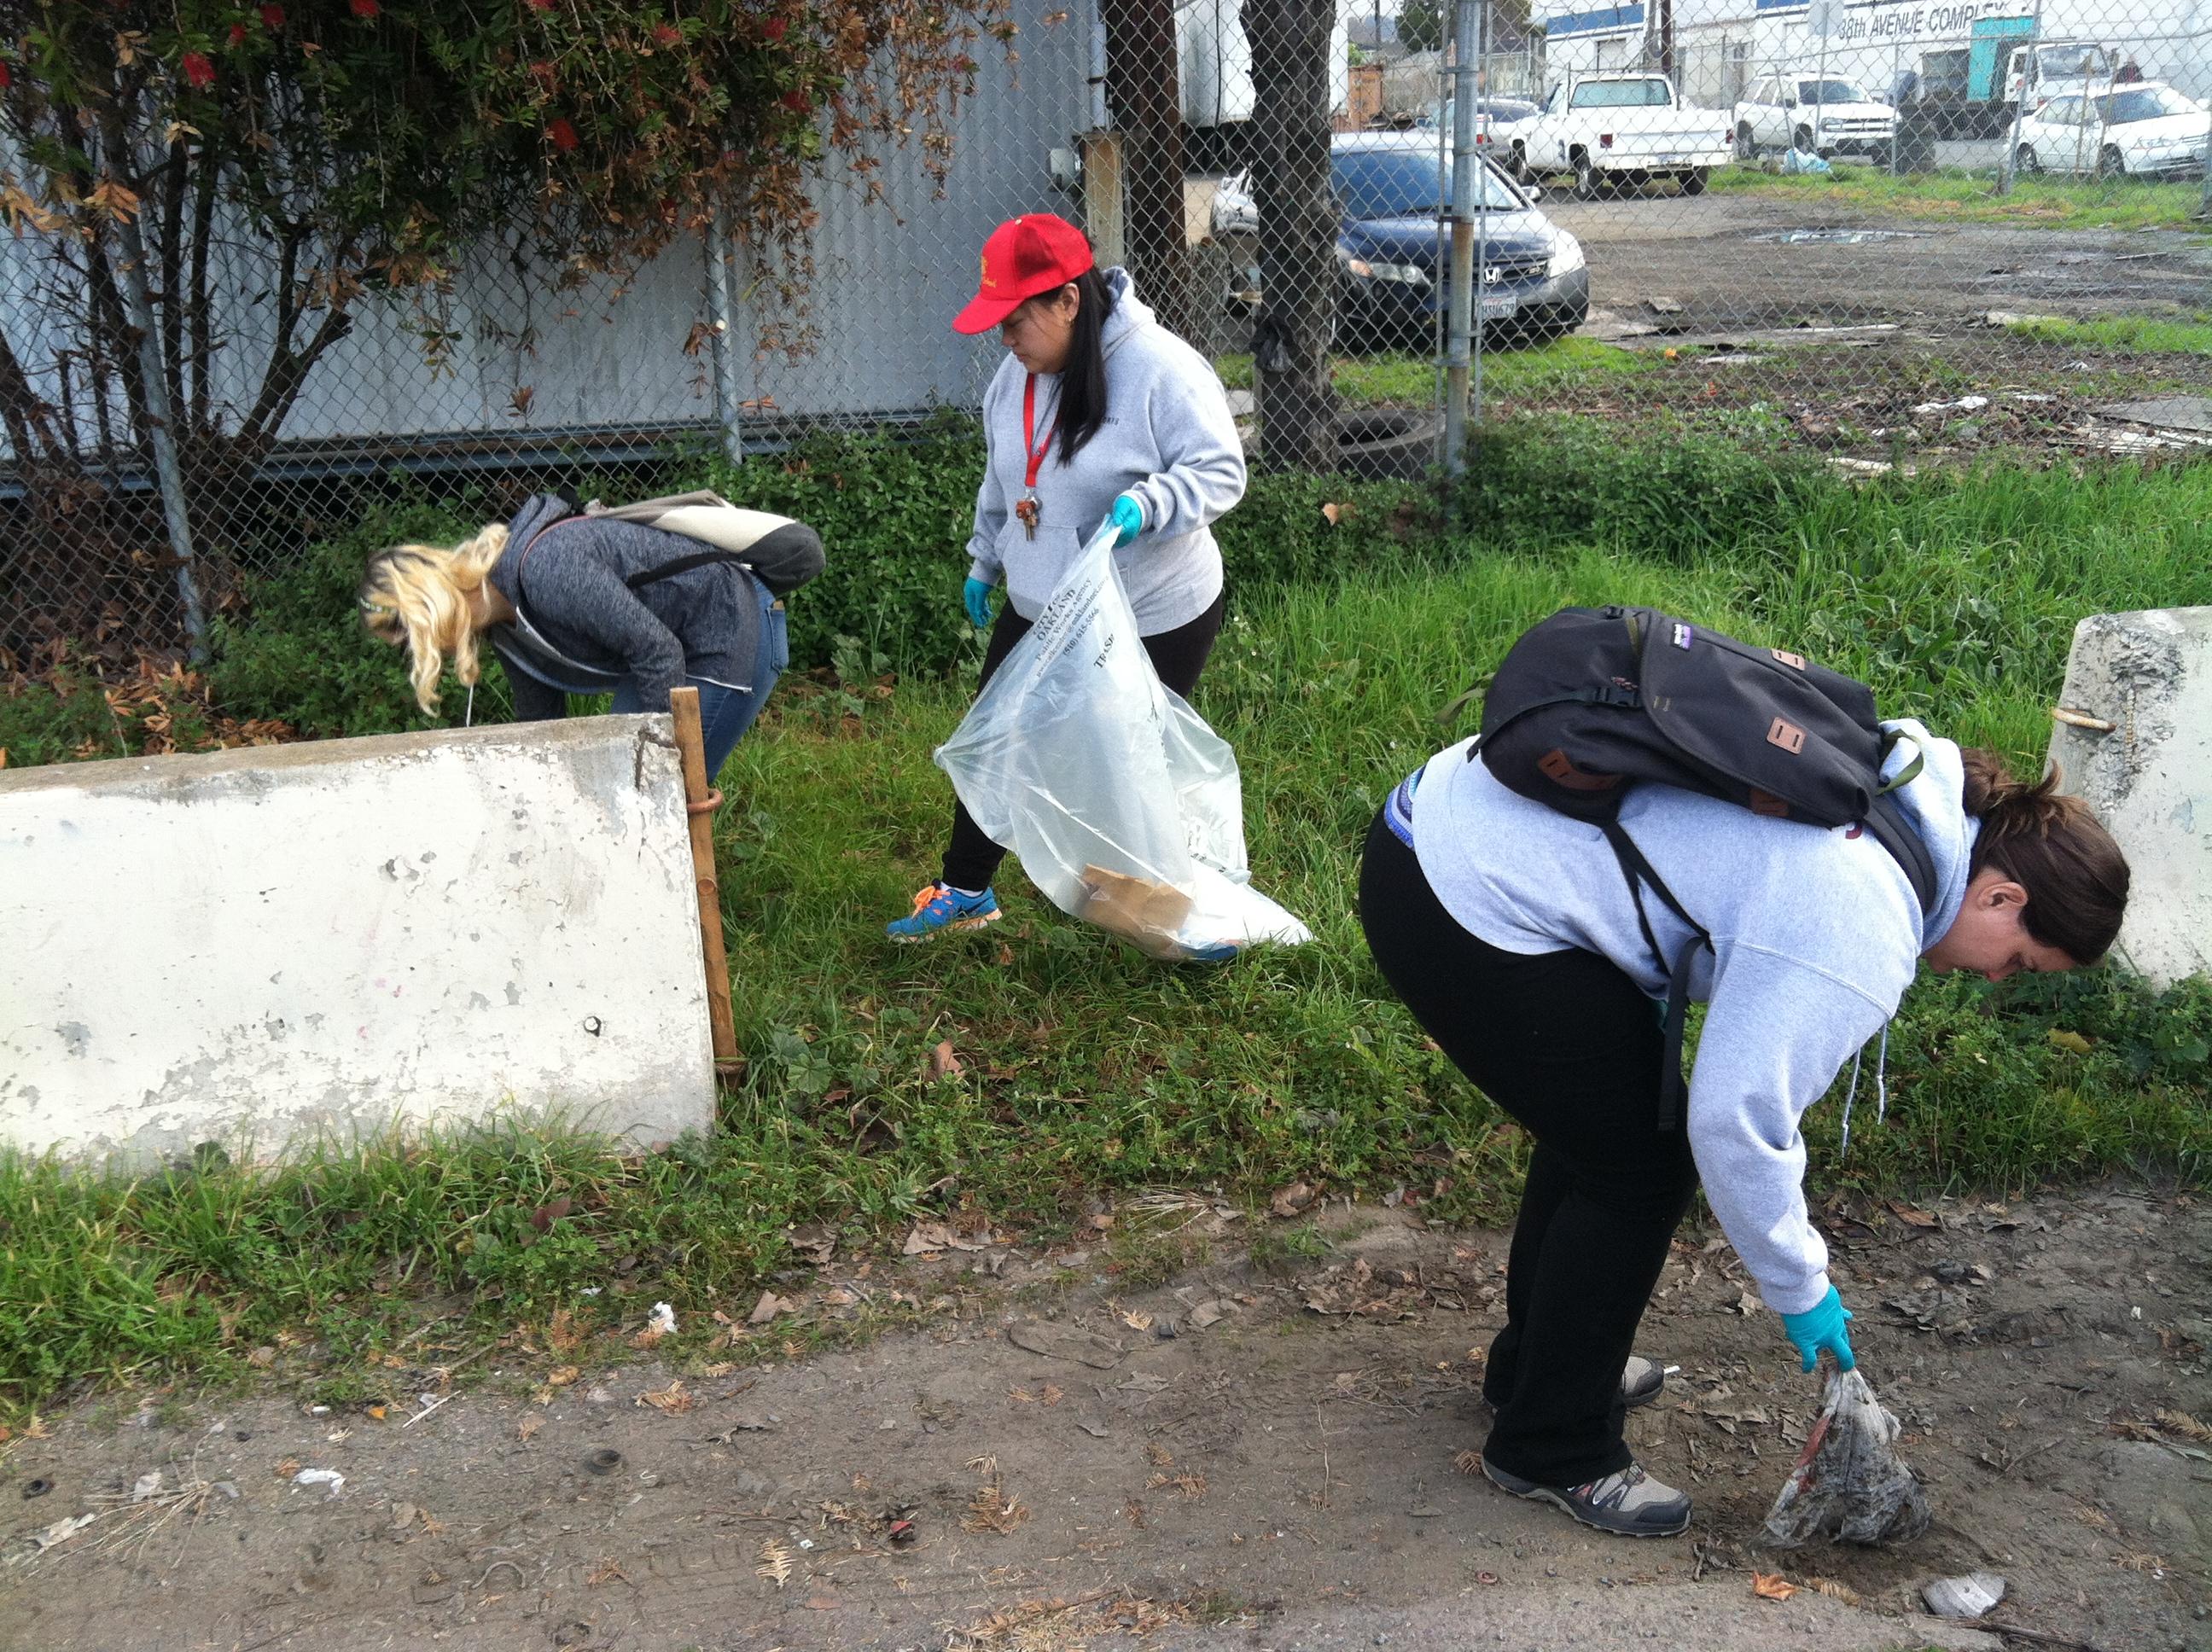 Picking up trash along 88th Avenue